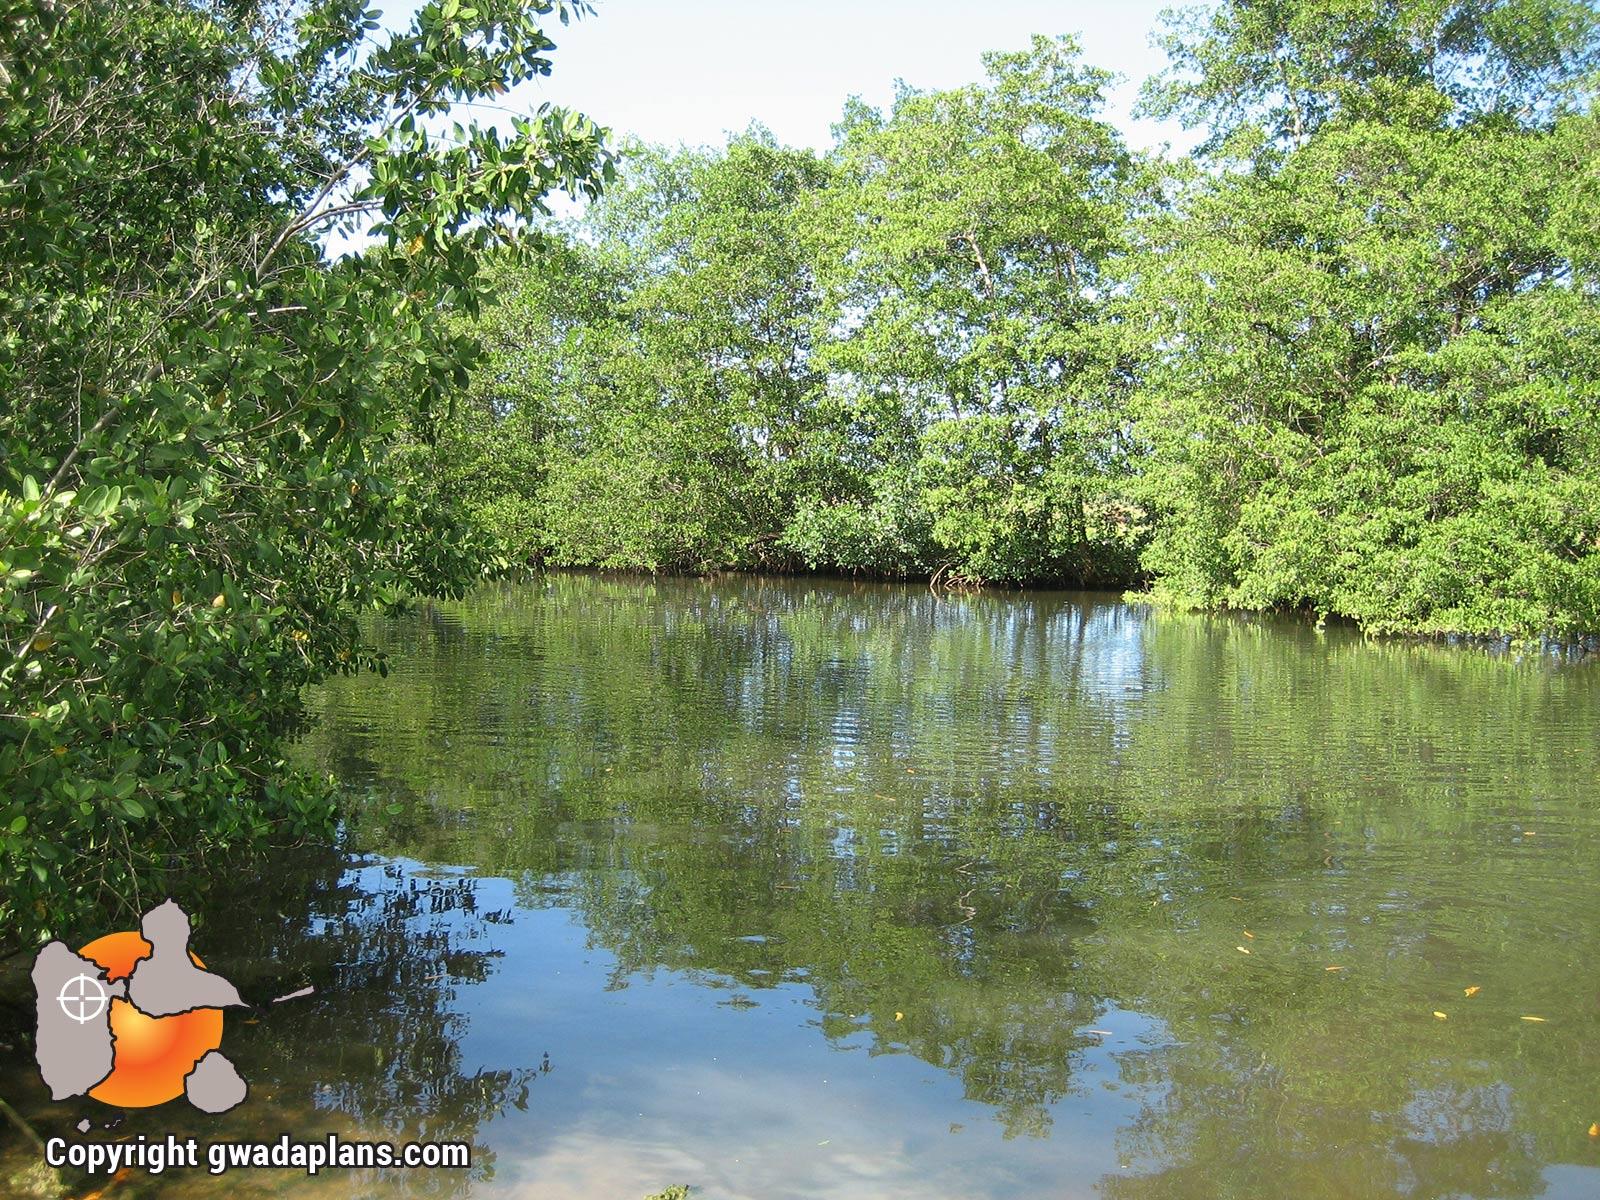 Le canal se termine en mangrove